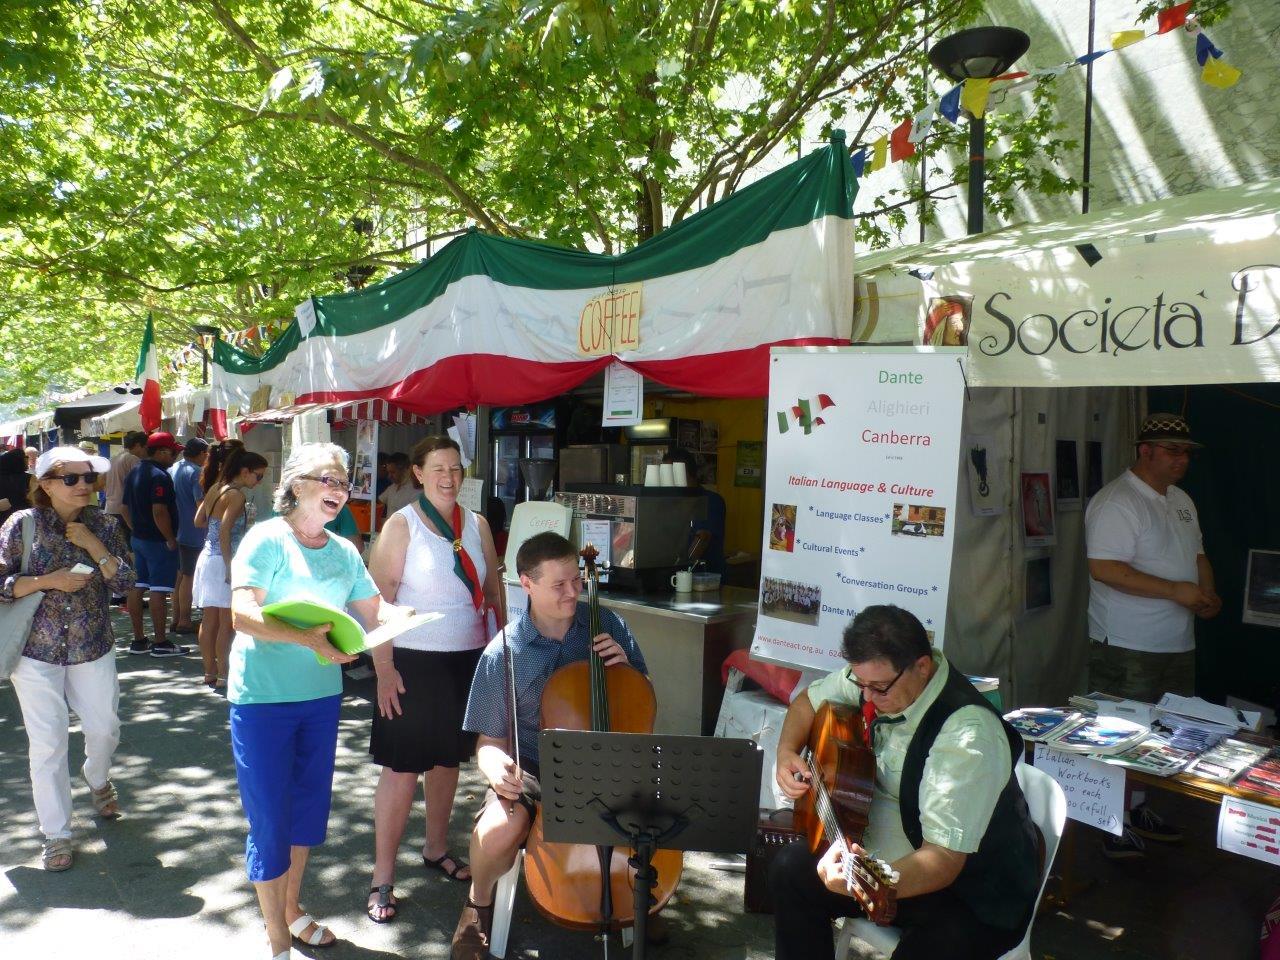 Yvette, Margaret, Matthew and Rod provide some entertainment outside the Dante stall